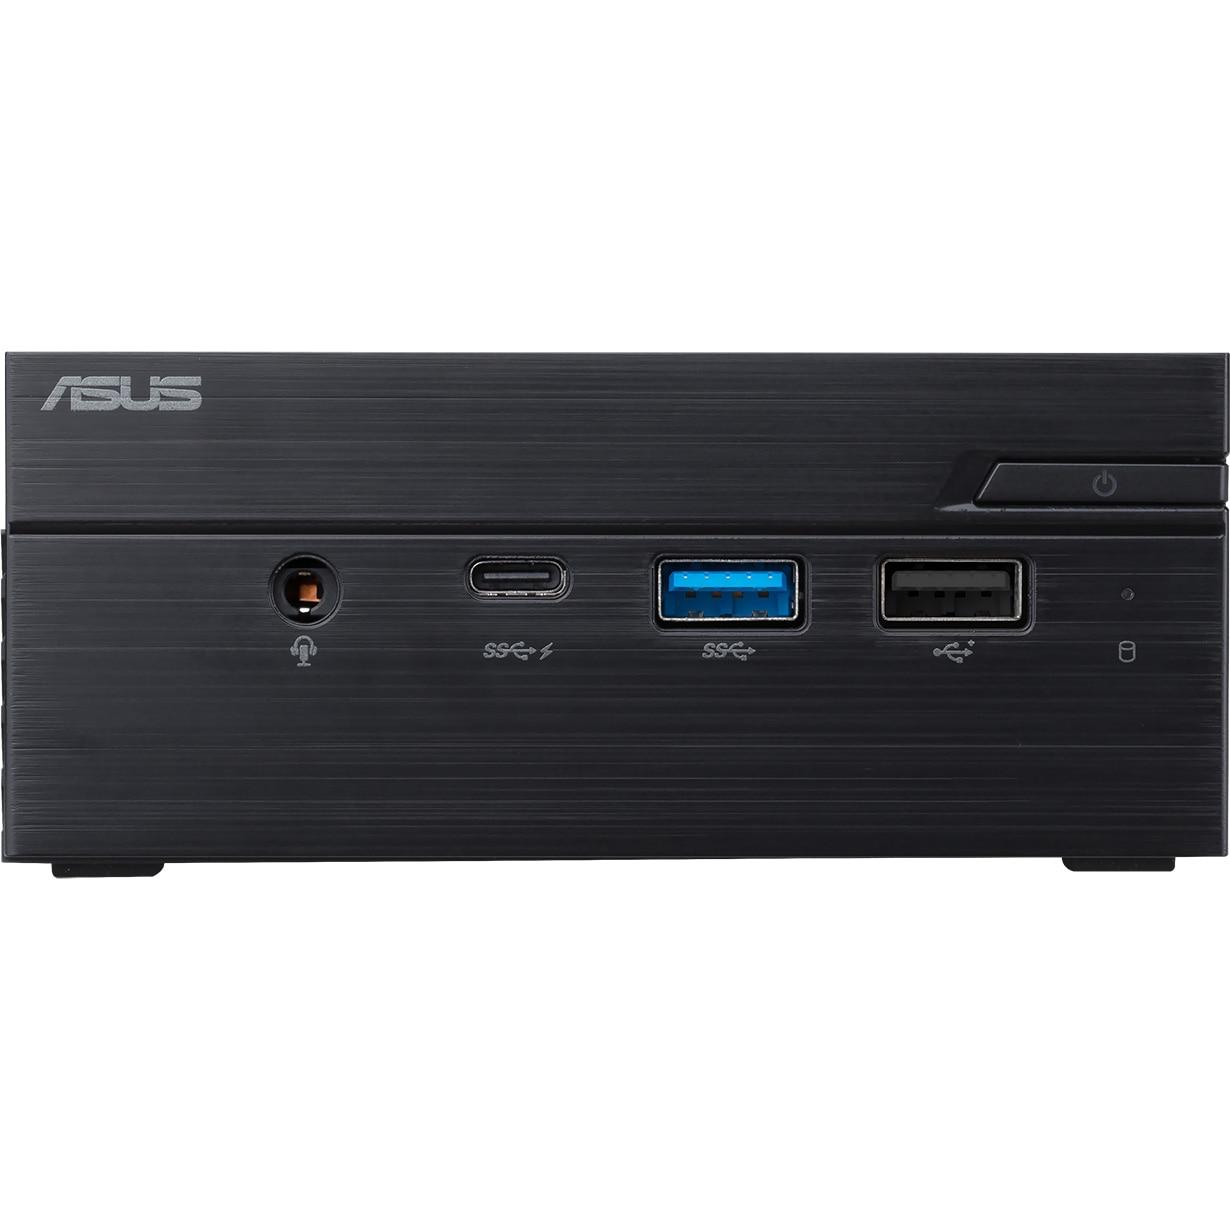 Fotografie Mini PC ASUS Ultracompact PN60 cu procesor Intel® Core™ i3-8130U pana la 3.40 GHz, Kaby Lake, 2 x DDR4, no HDD, Intel® UHD Graphics 620, Free DOS